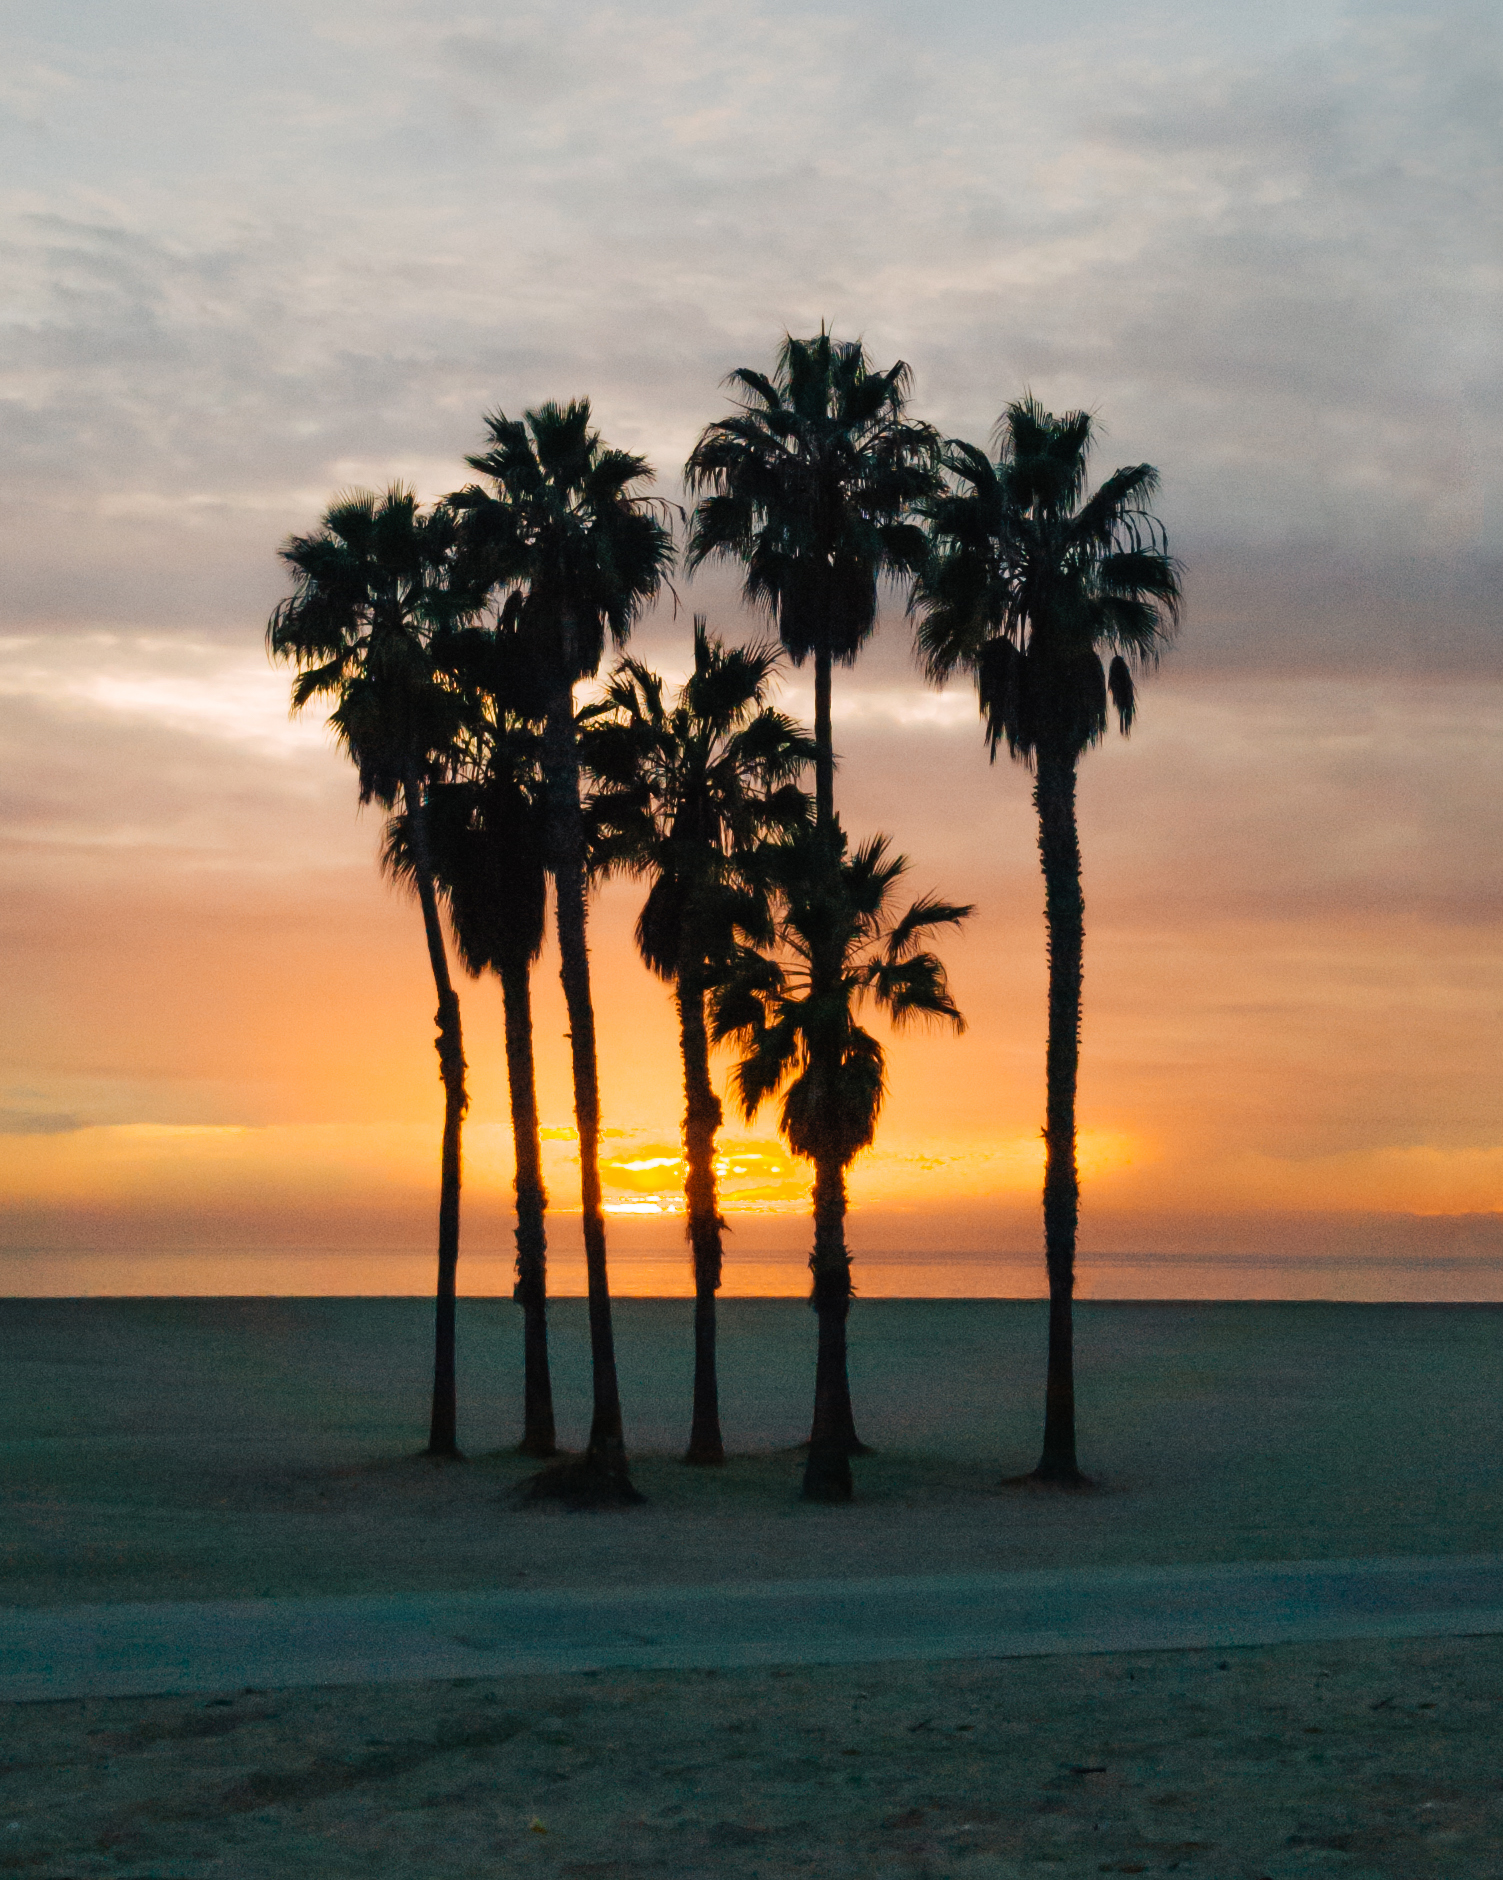 10_SunsetPalmTrees.jpg